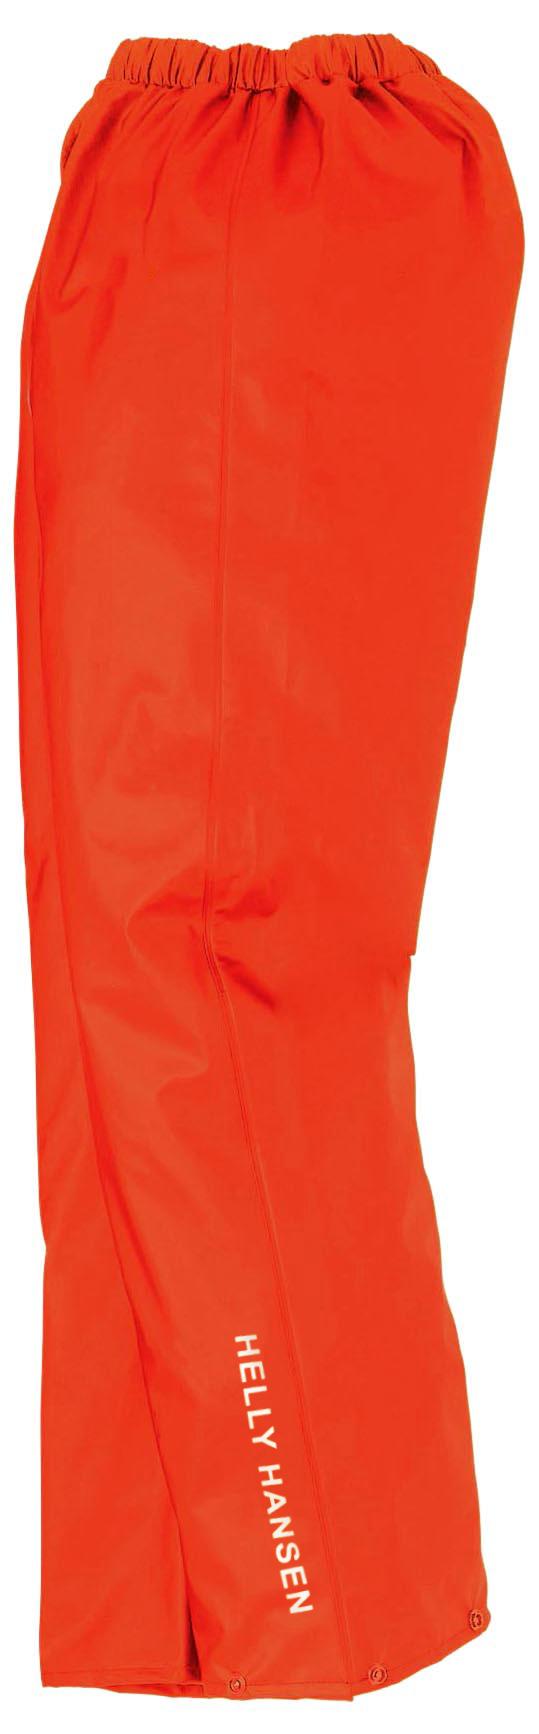 helly hansen mens waterproof workwear voss trousers pants 70480 ebay. Black Bedroom Furniture Sets. Home Design Ideas